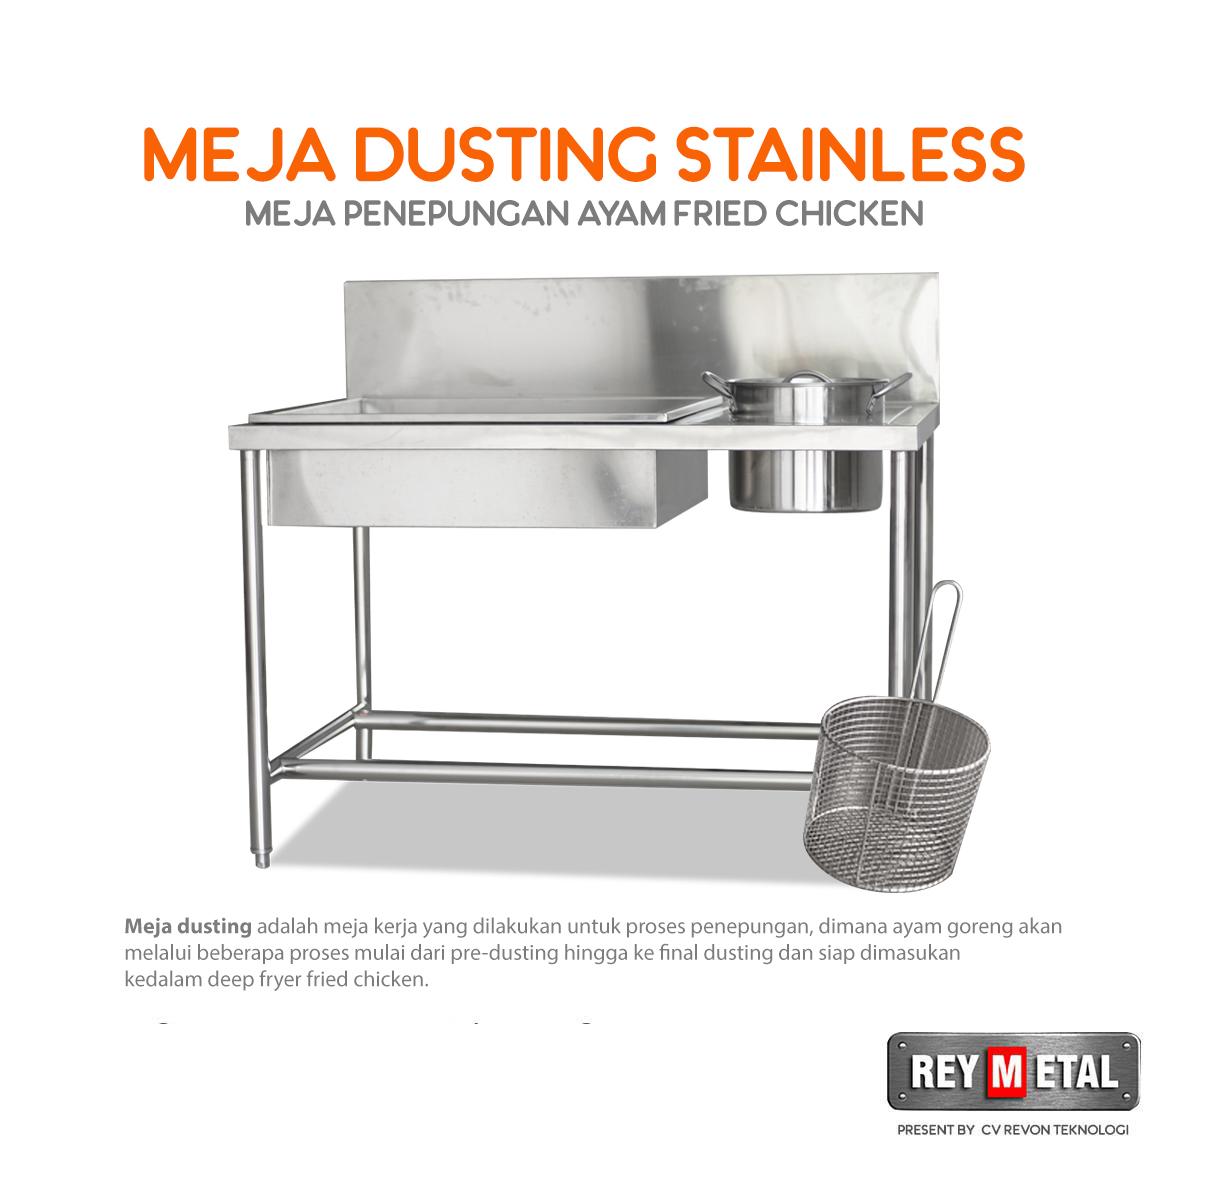 Jual Meja Dusting Stainless Steel di Jogja